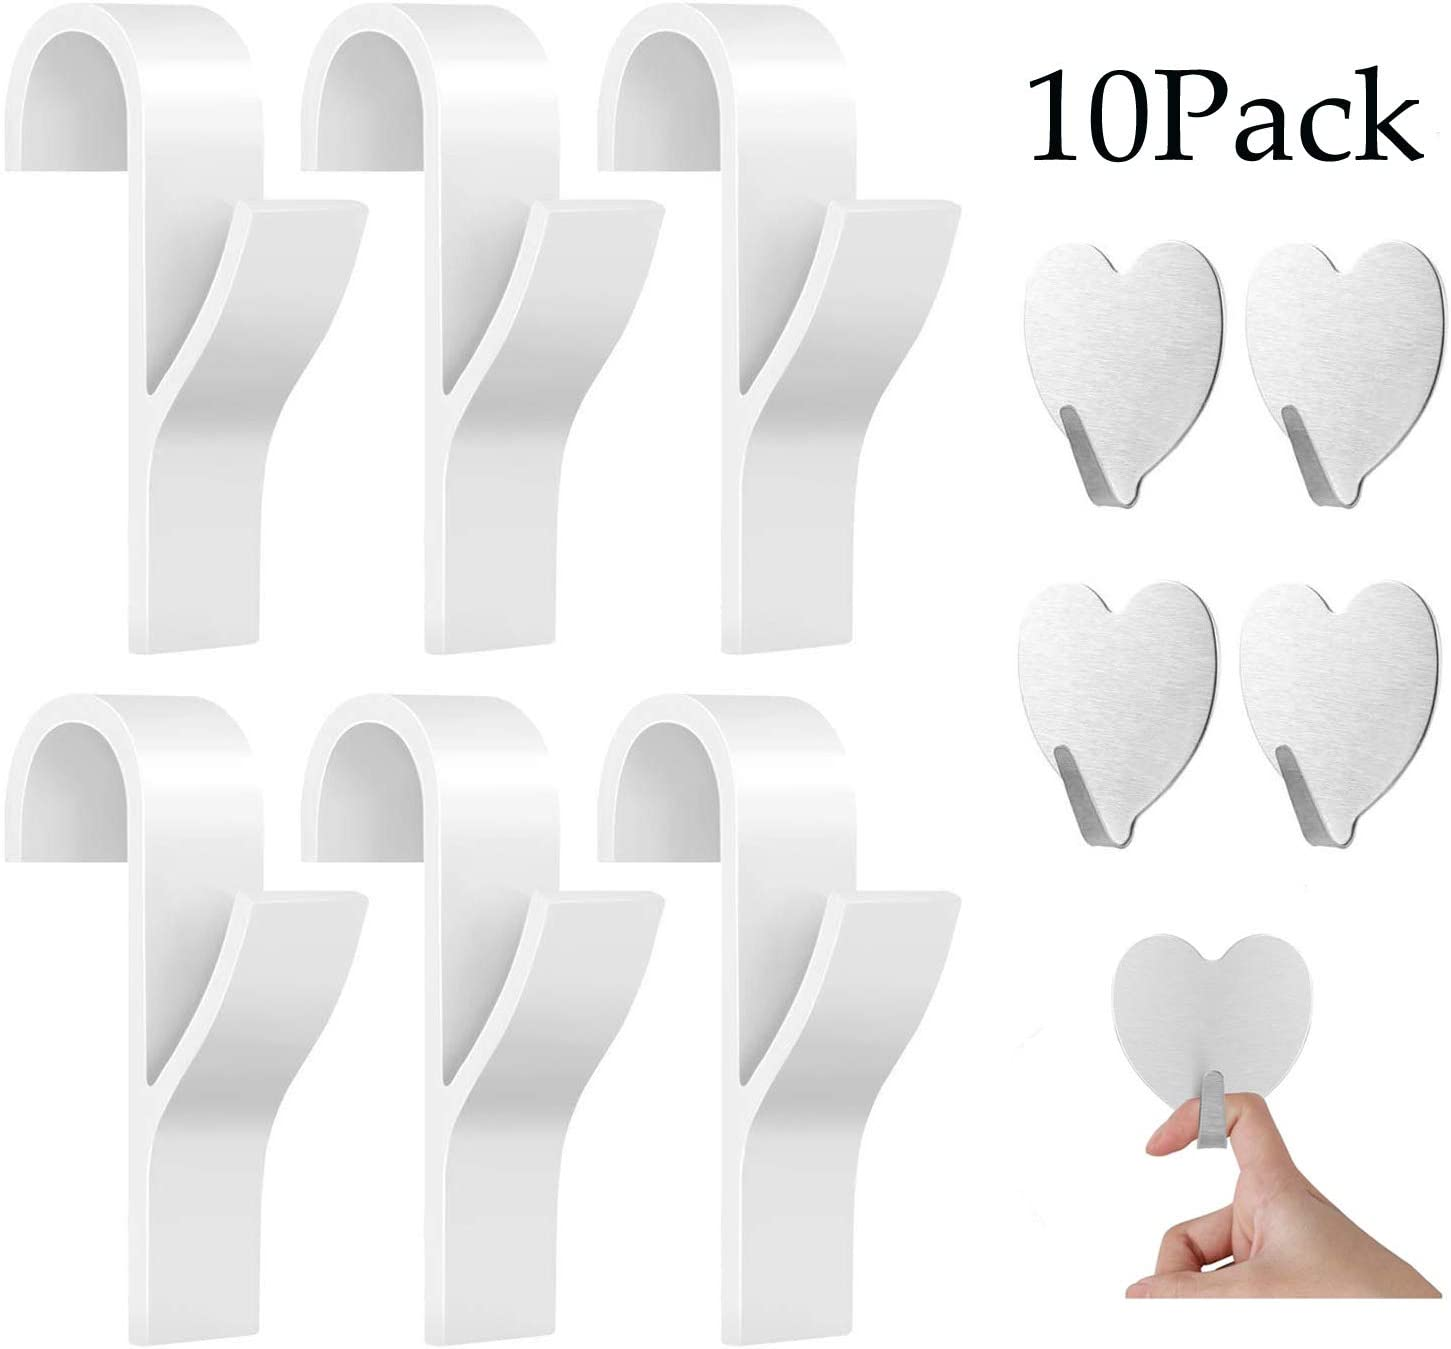 JOYUE Gancho para Radiador Toallero, Gancho para Radiador de Toalla de 6 Piezas y 4 Piezas Ganchos Adhesivos Toalla (10 piezas)